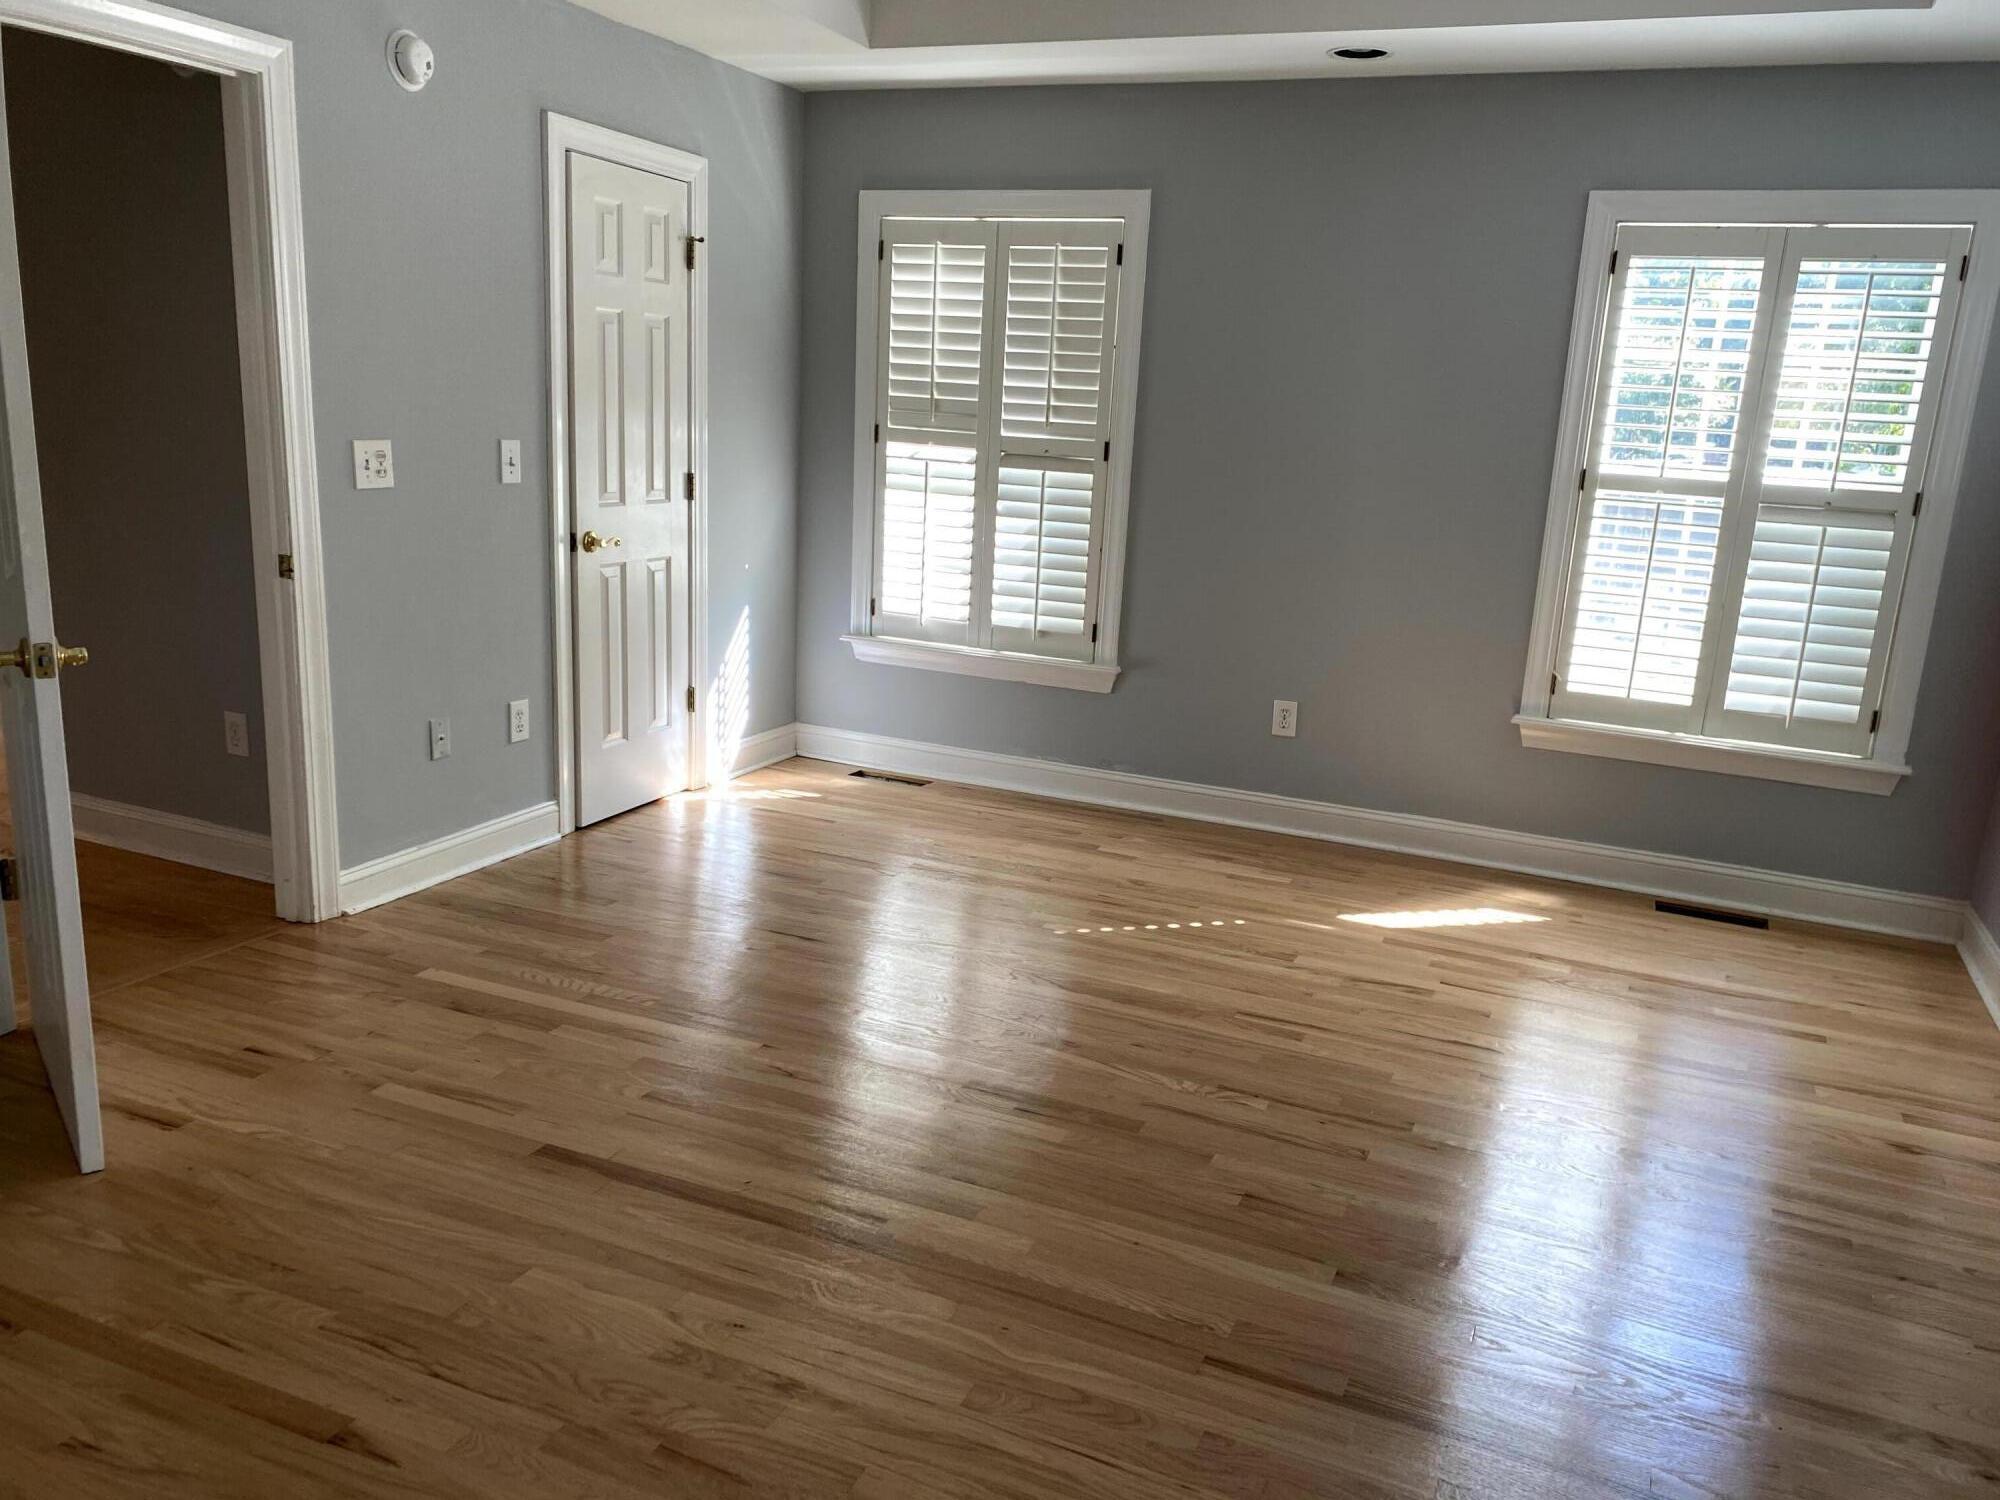 Lakeshore Homes For Sale - 1445 Waterside, Mount Pleasant, SC - 1